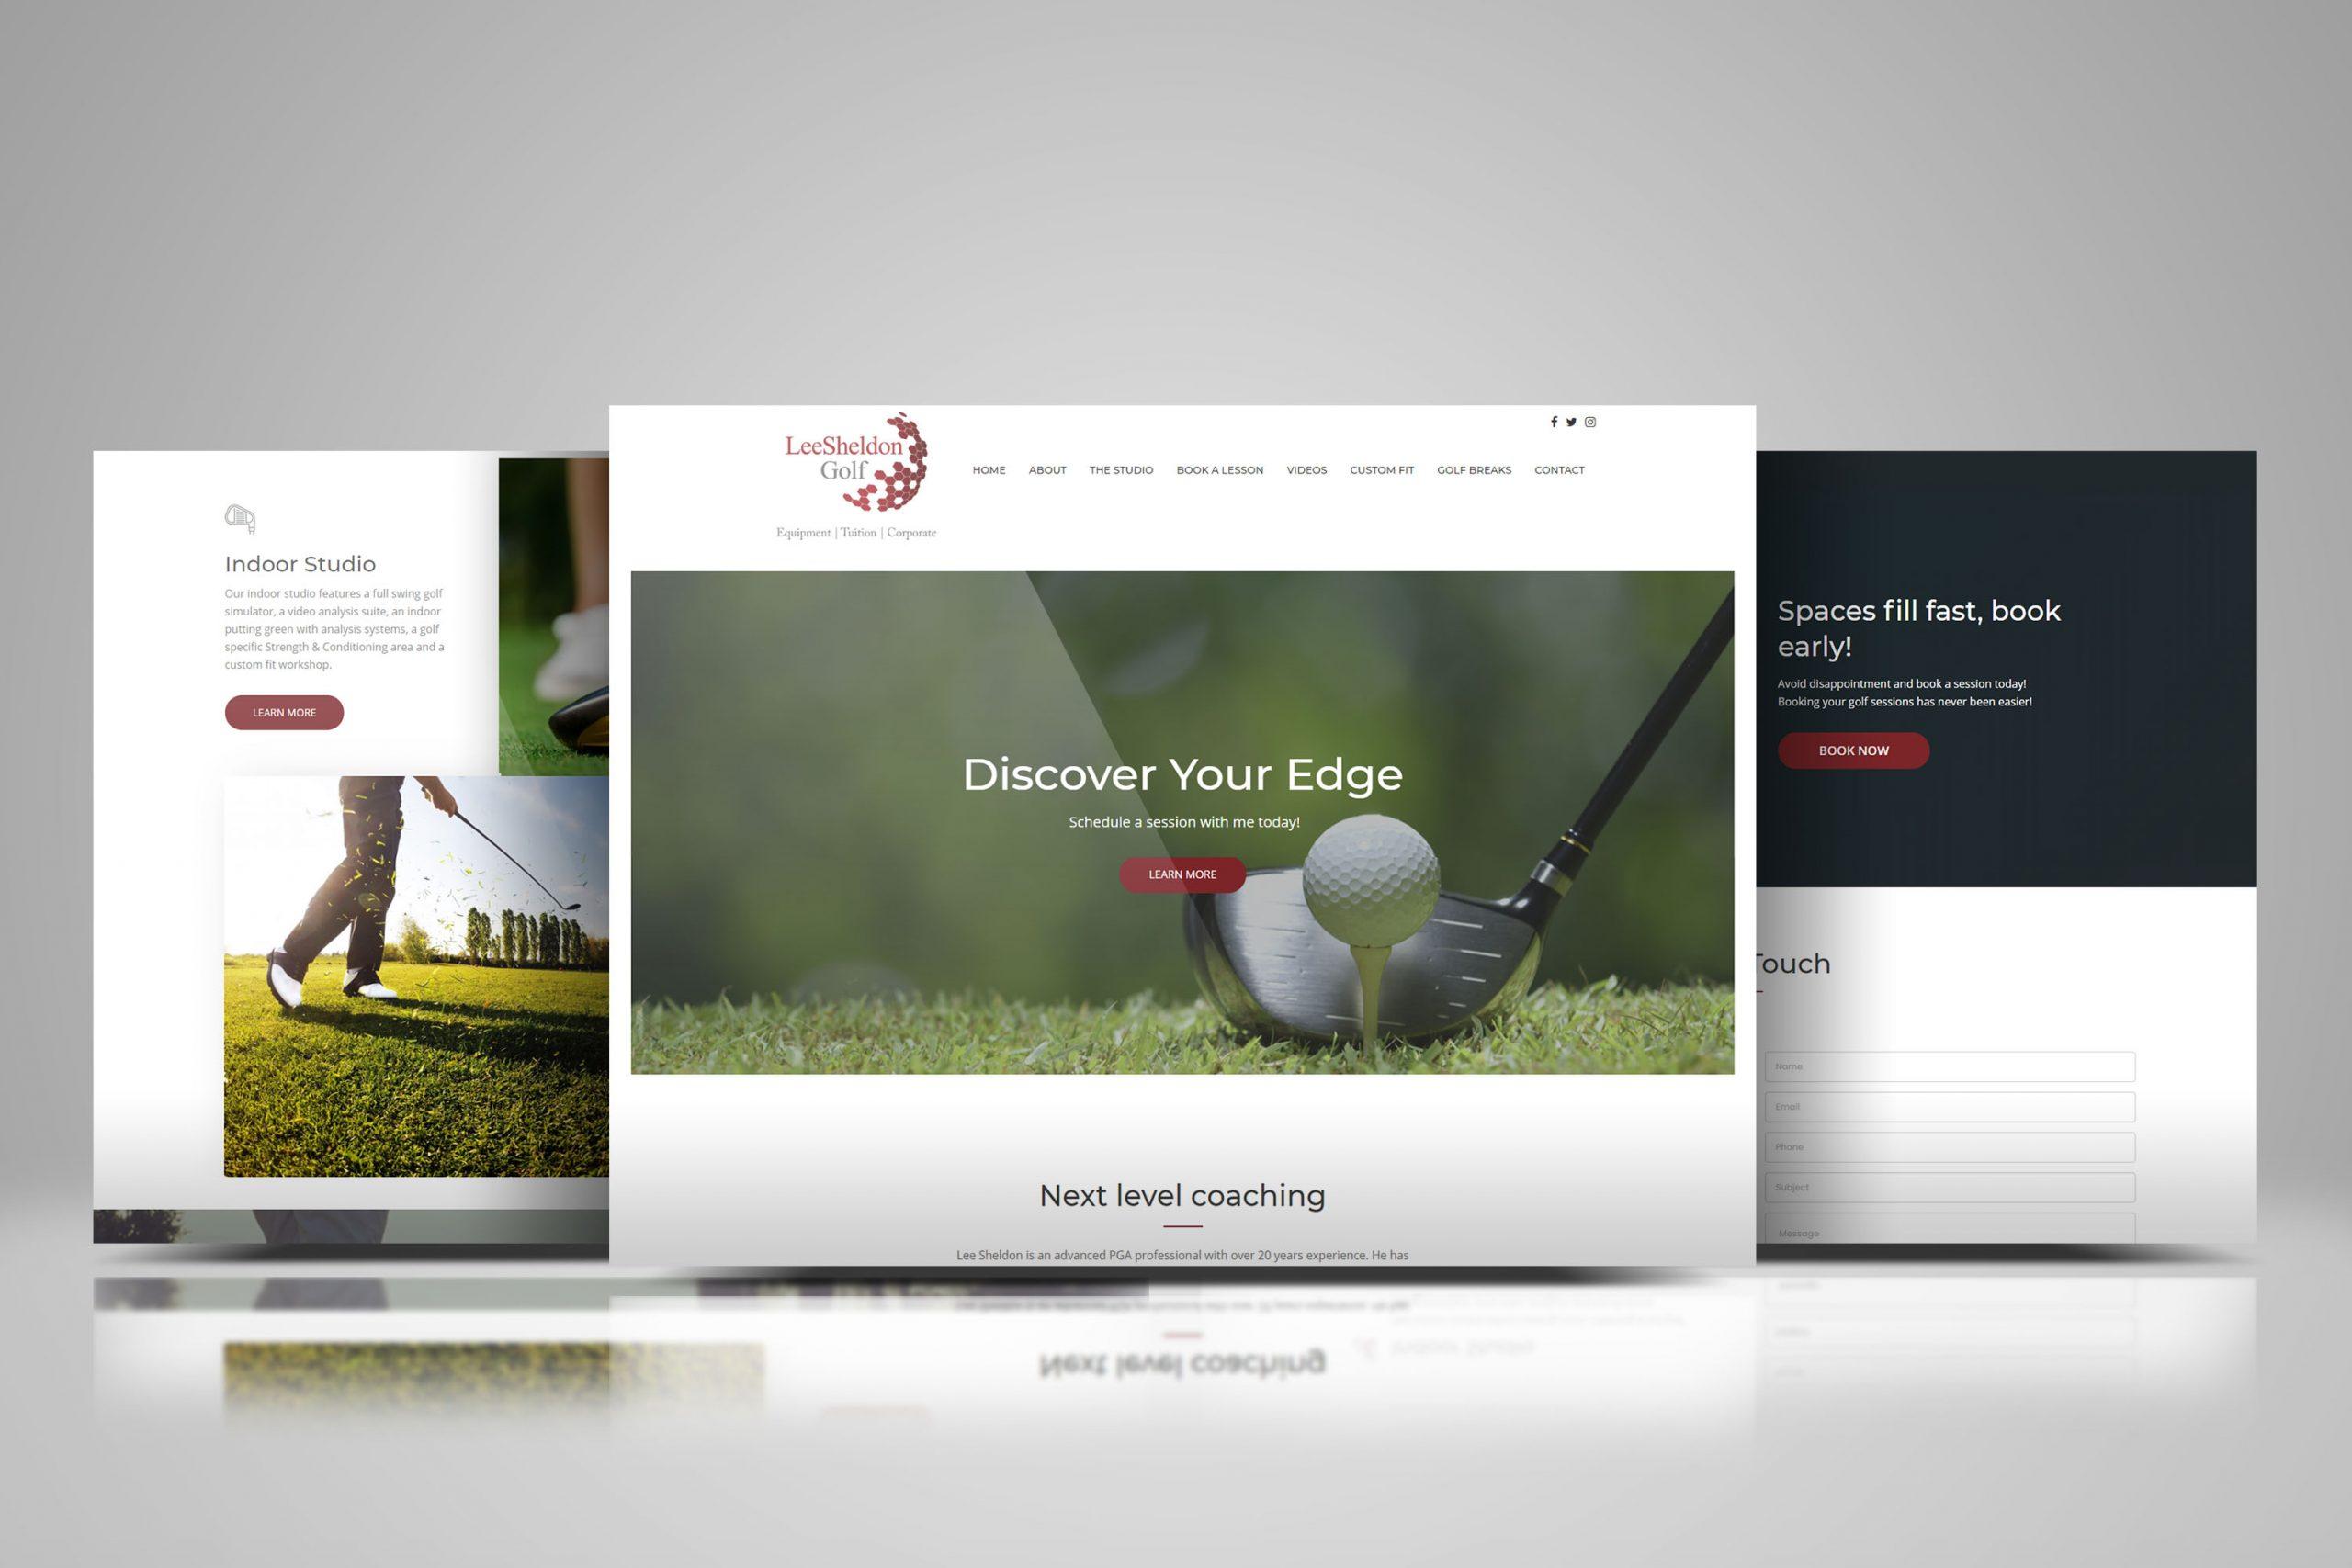 Lee Sheldon Golf